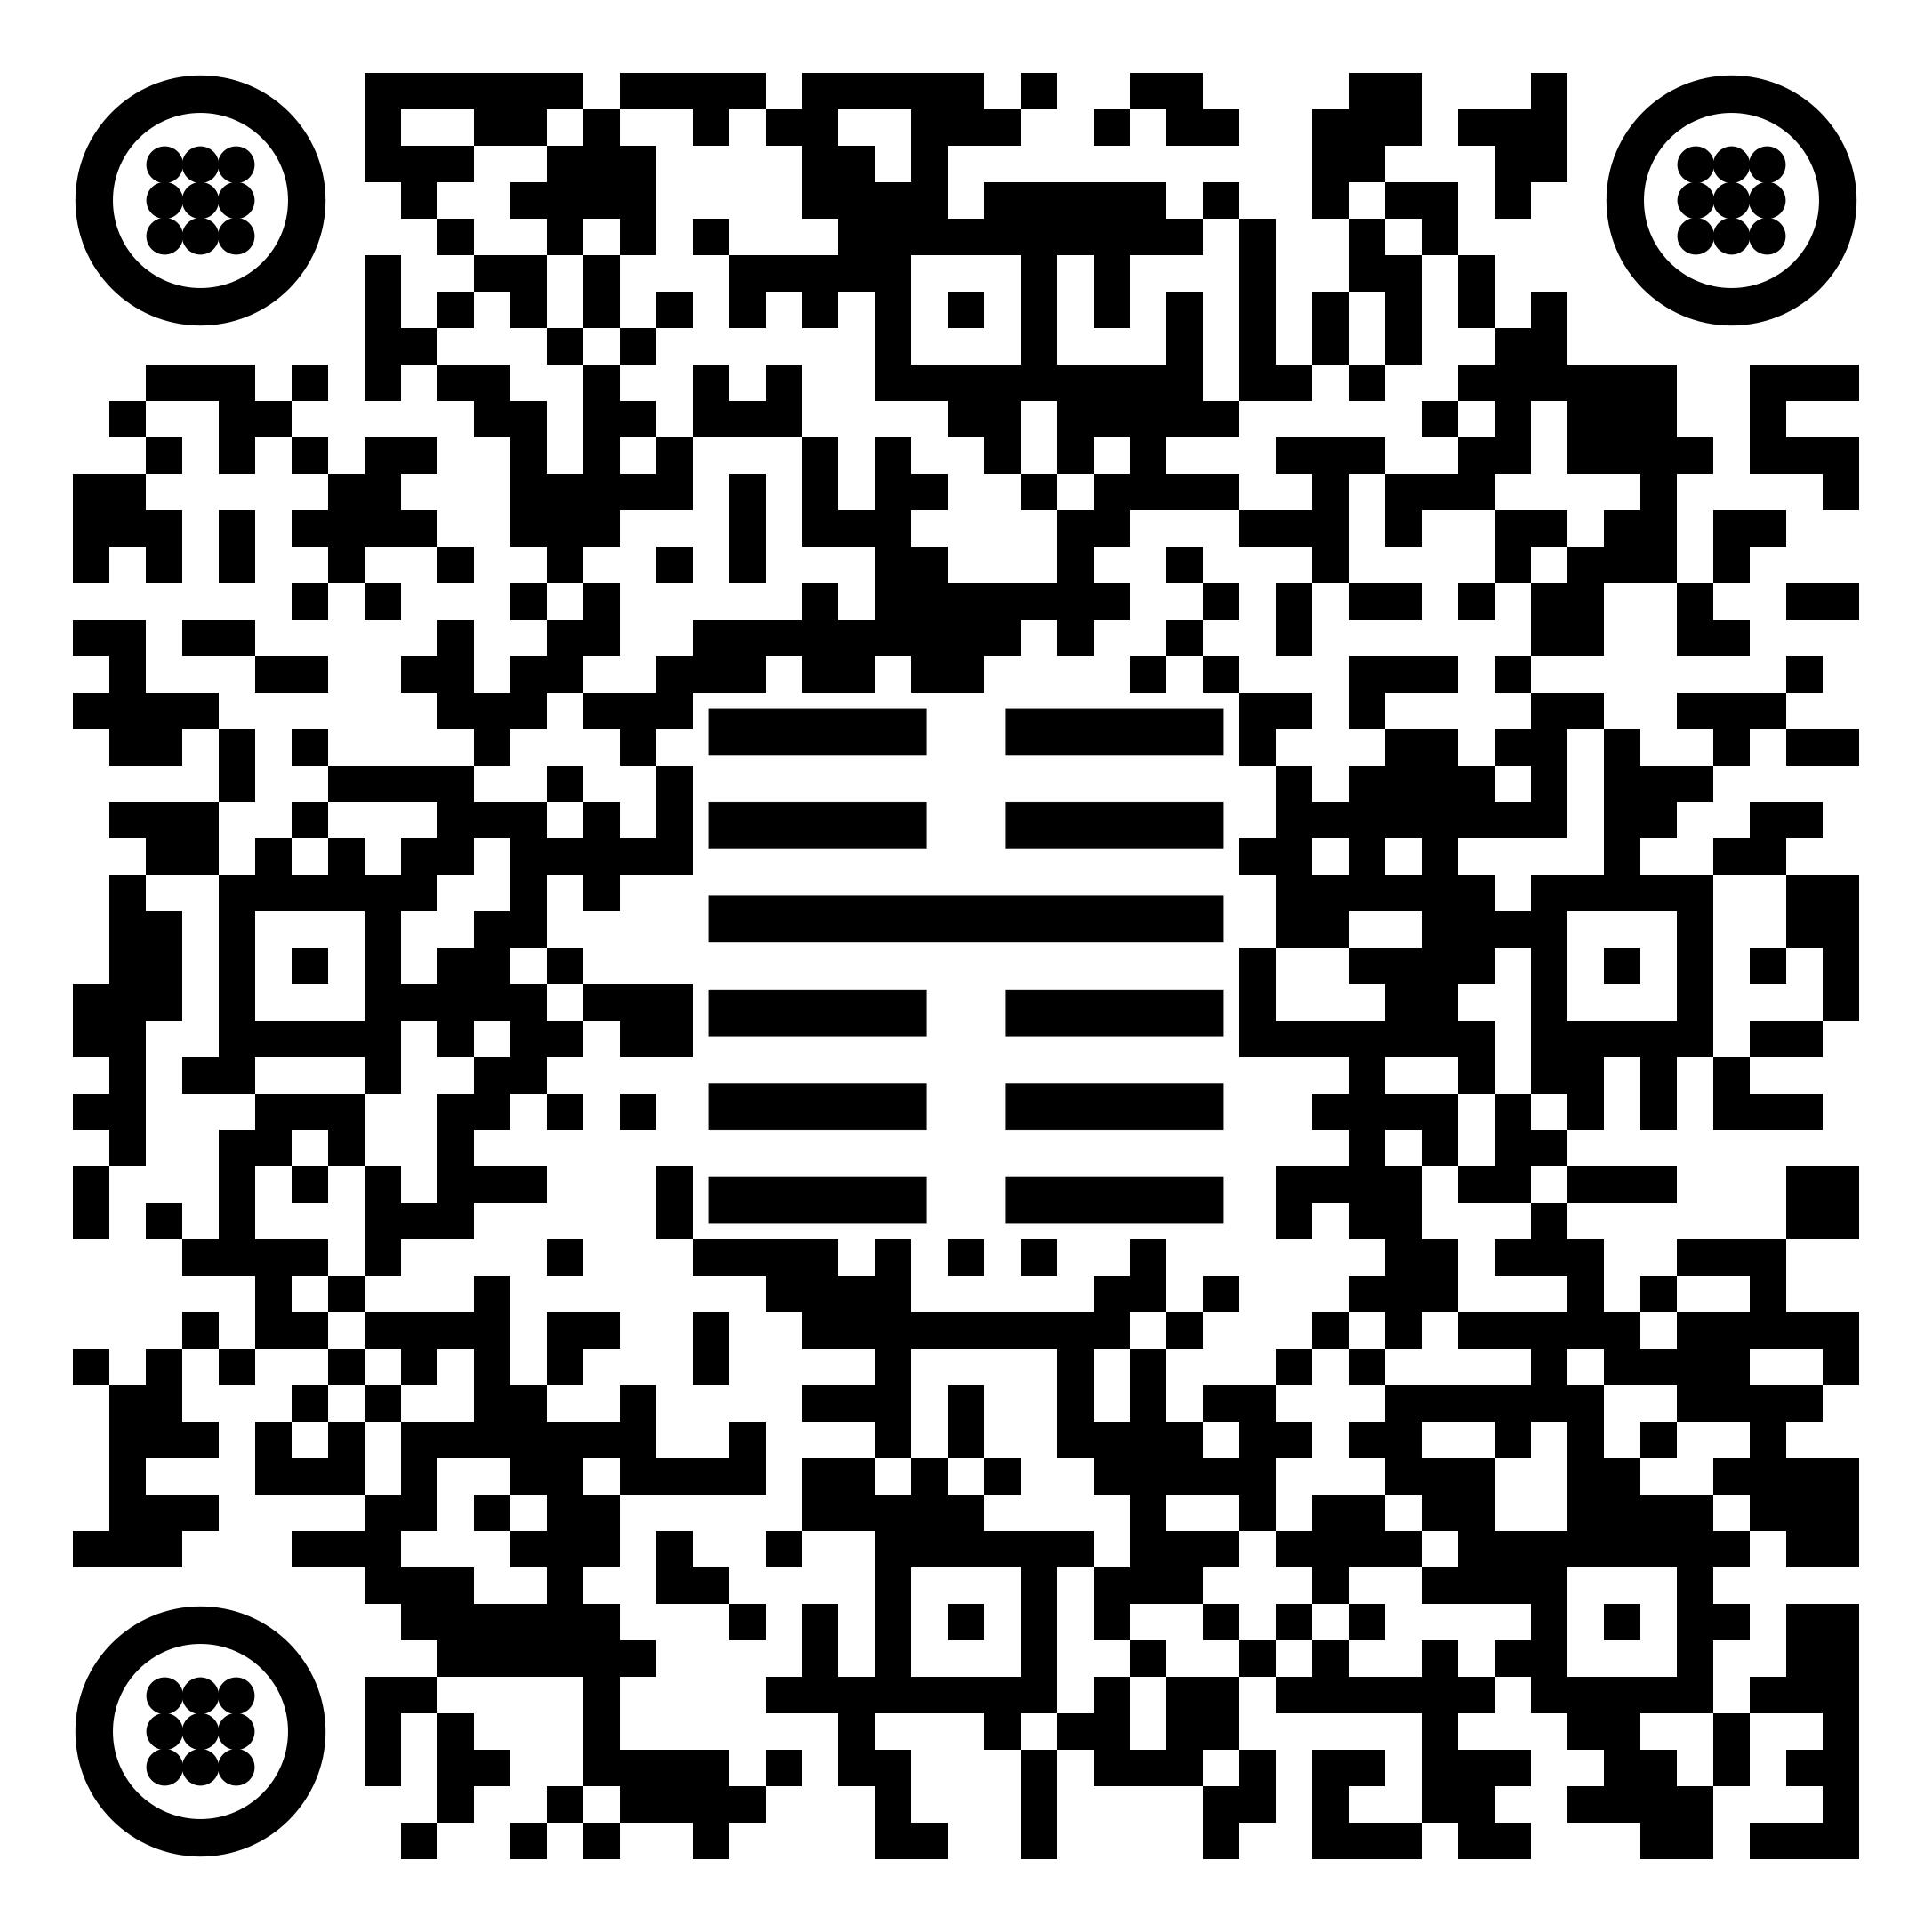 qr-code-16.png